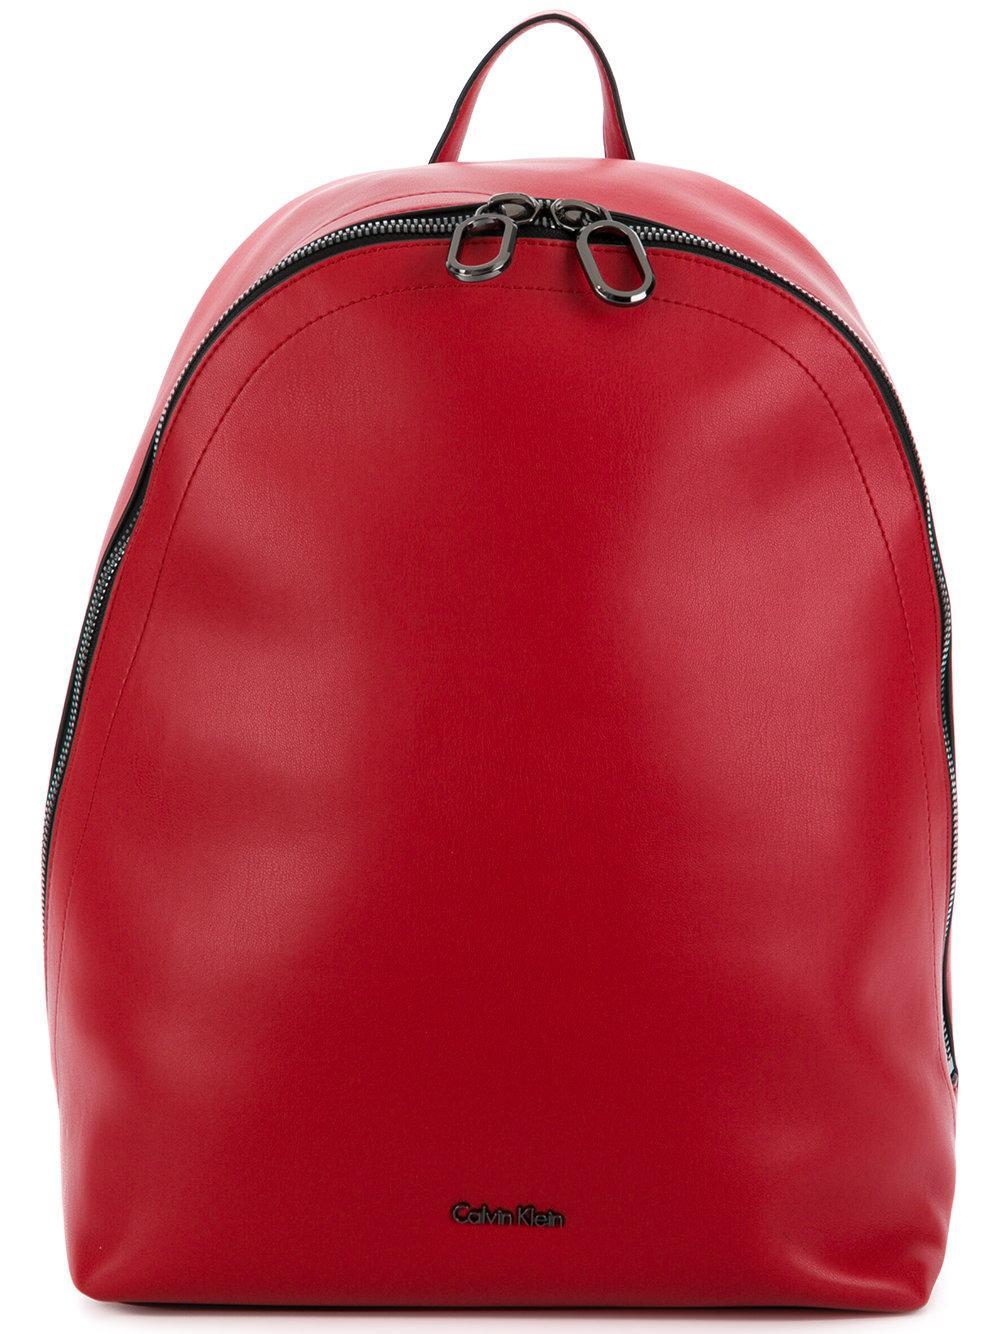 Calvin Klein 205W39Nyc Minimalist Backpack - Red